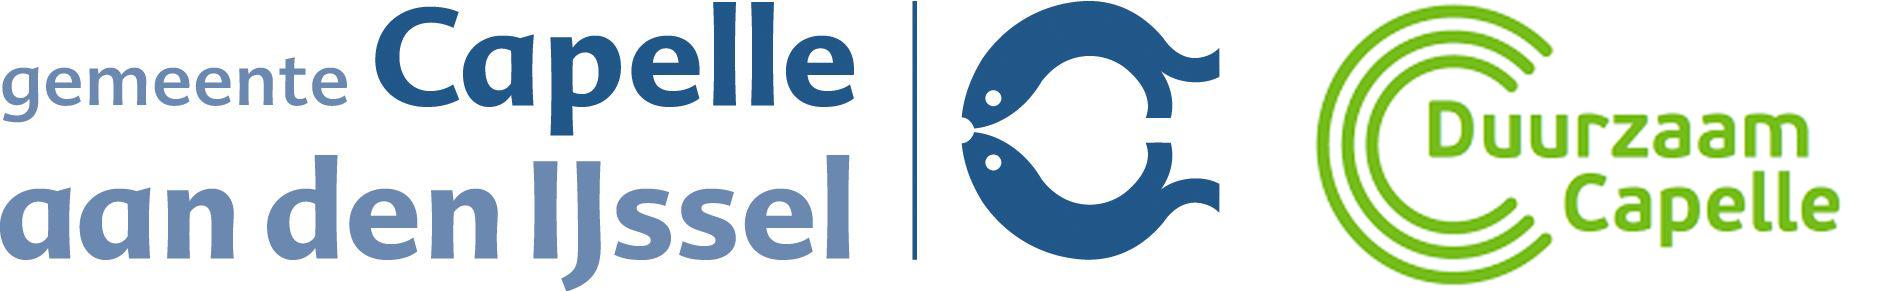 logo's Capelle